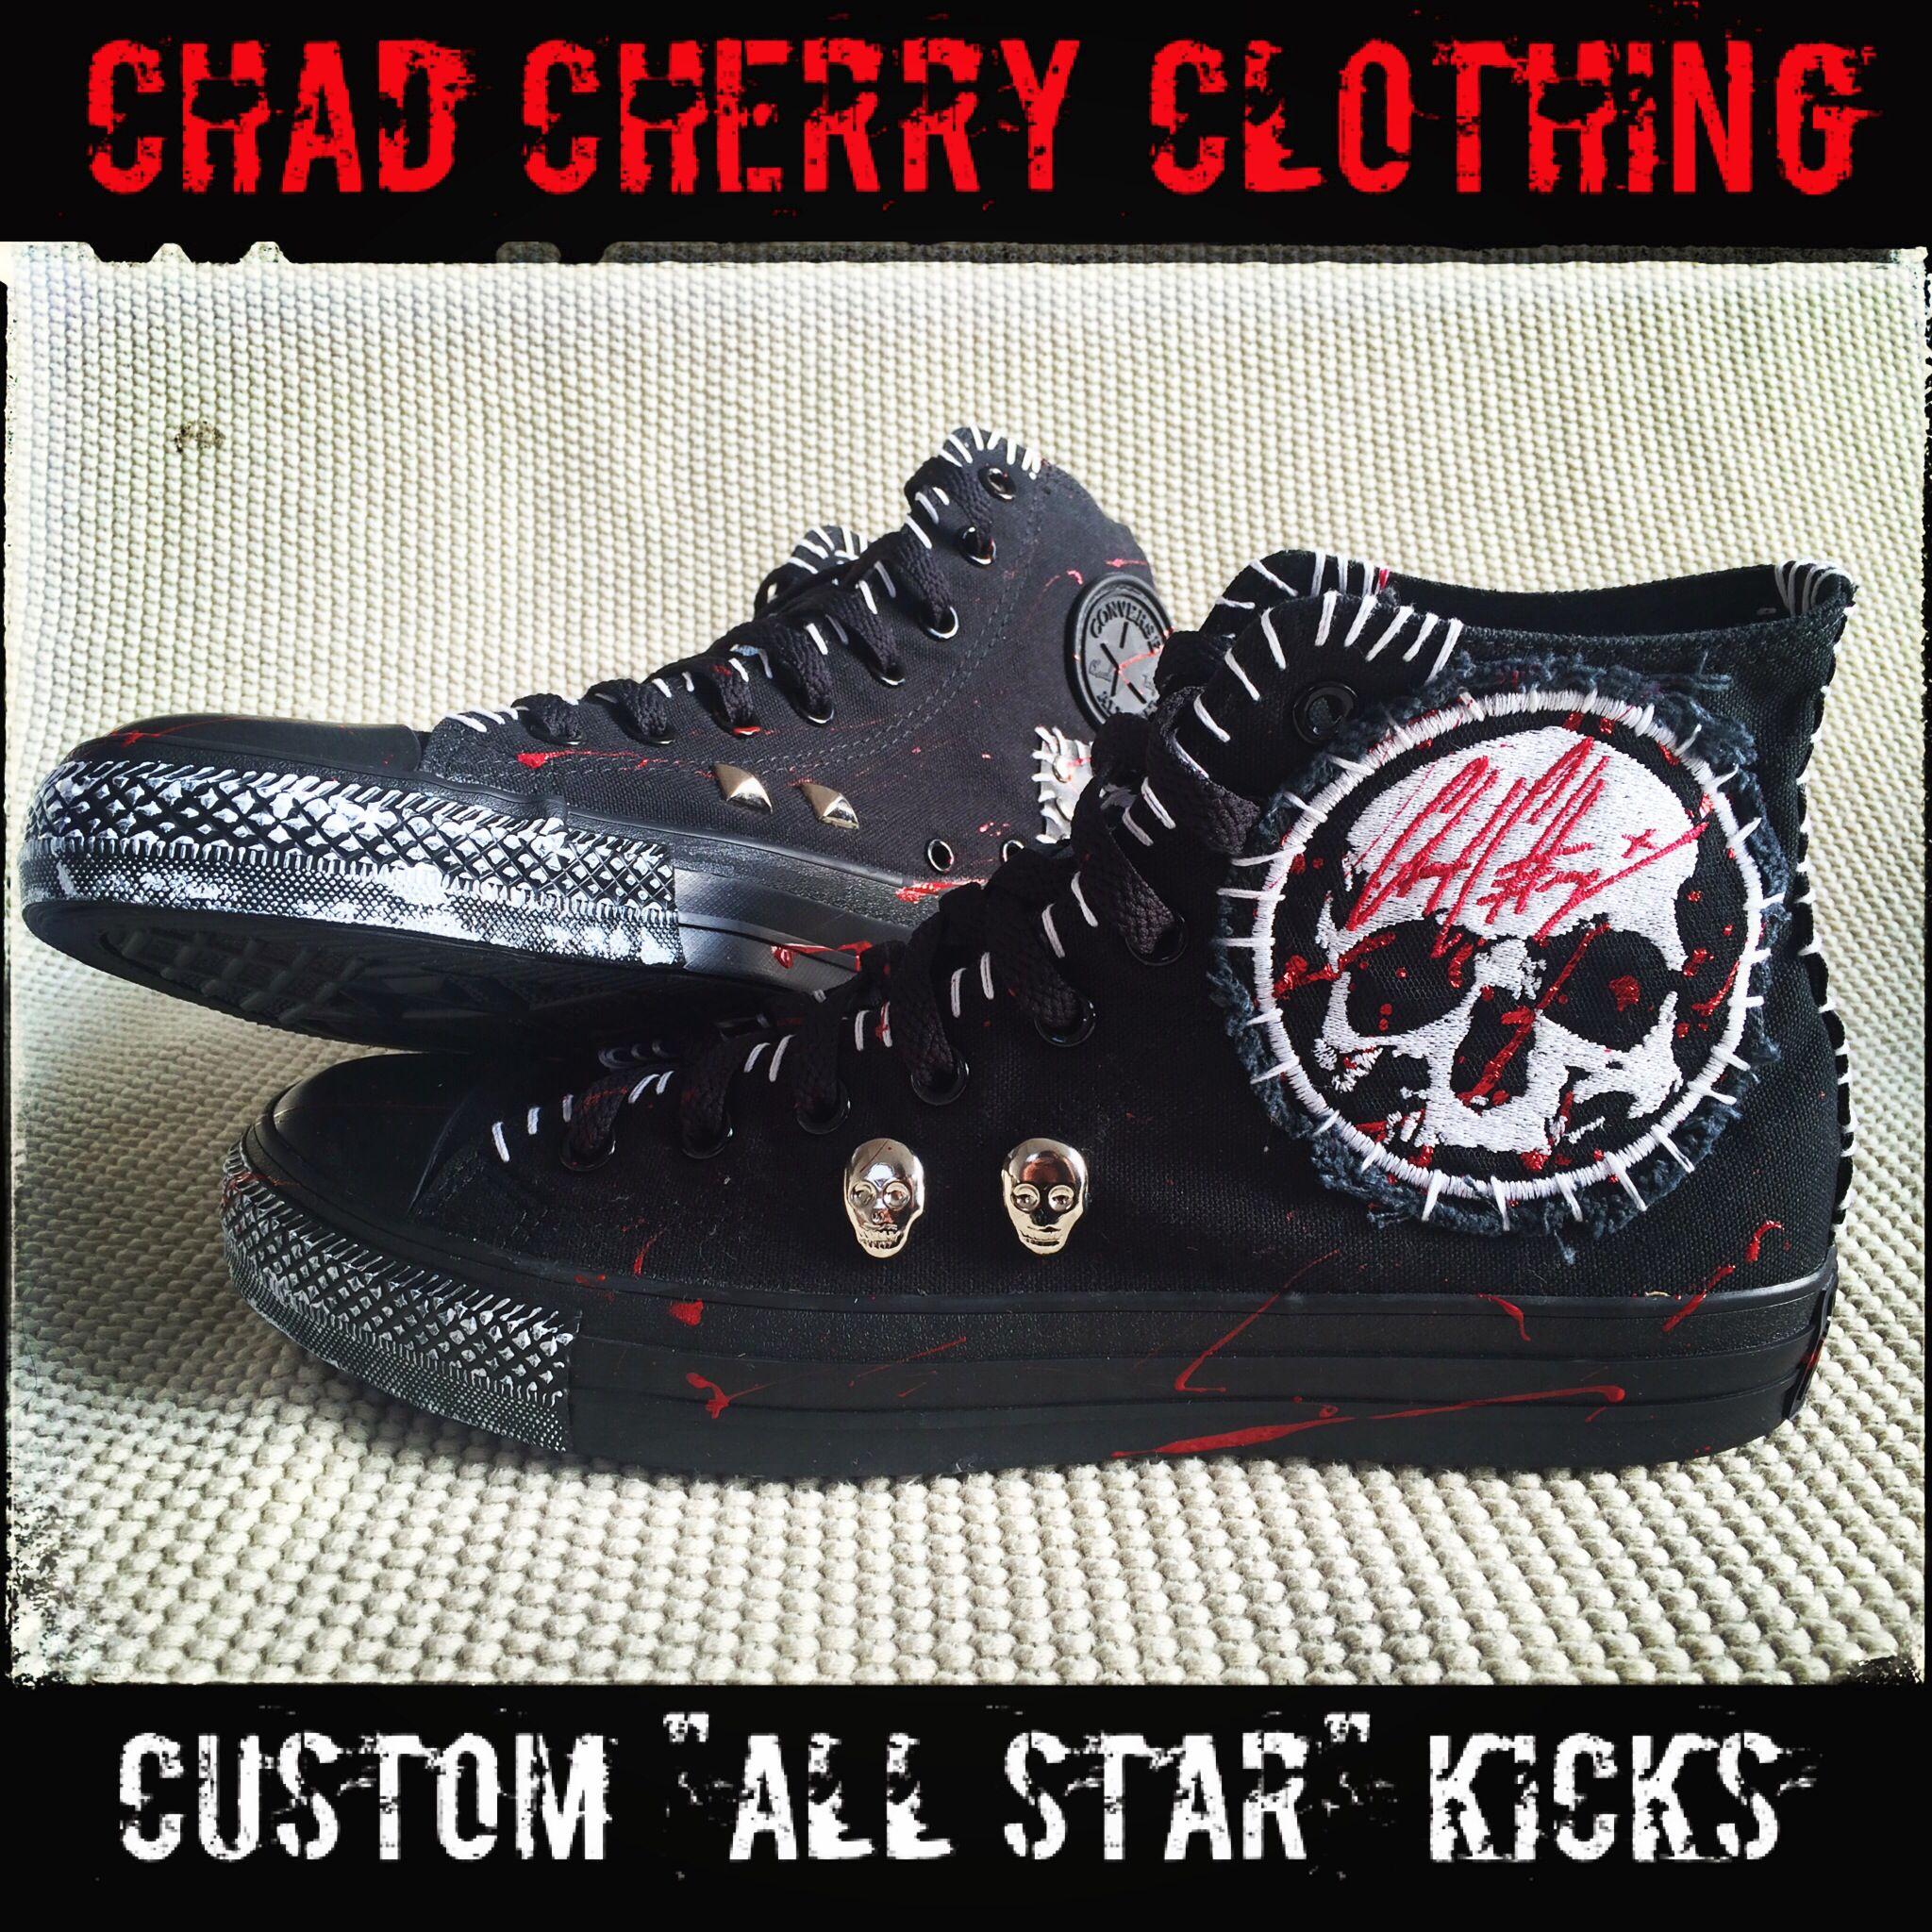 7dbfaaf8e269 Chad Cherry custom